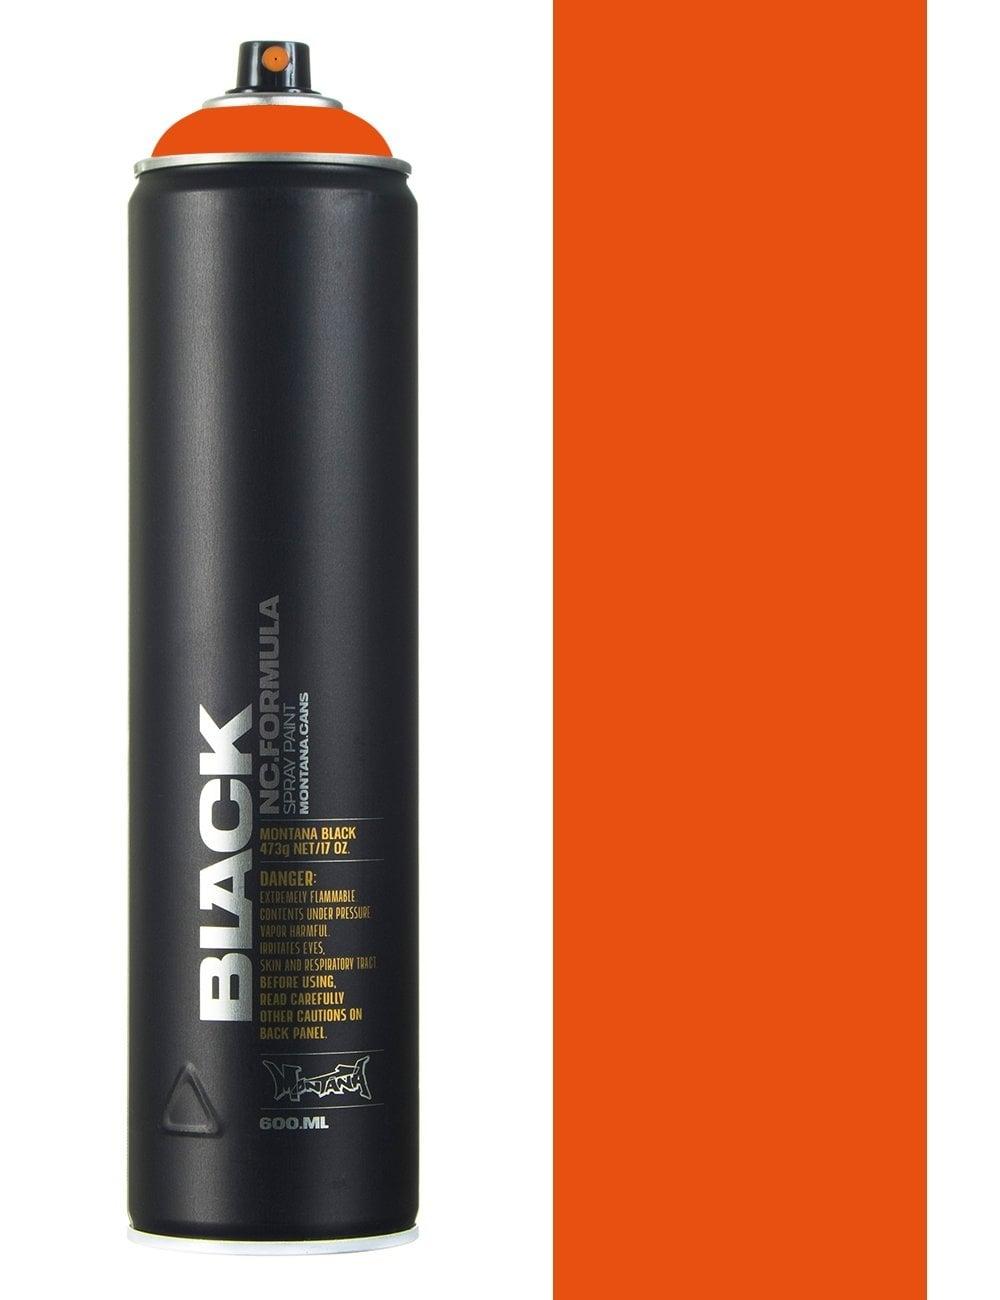 Montana Black Halloween Spray Paint 600ml Spray Paint